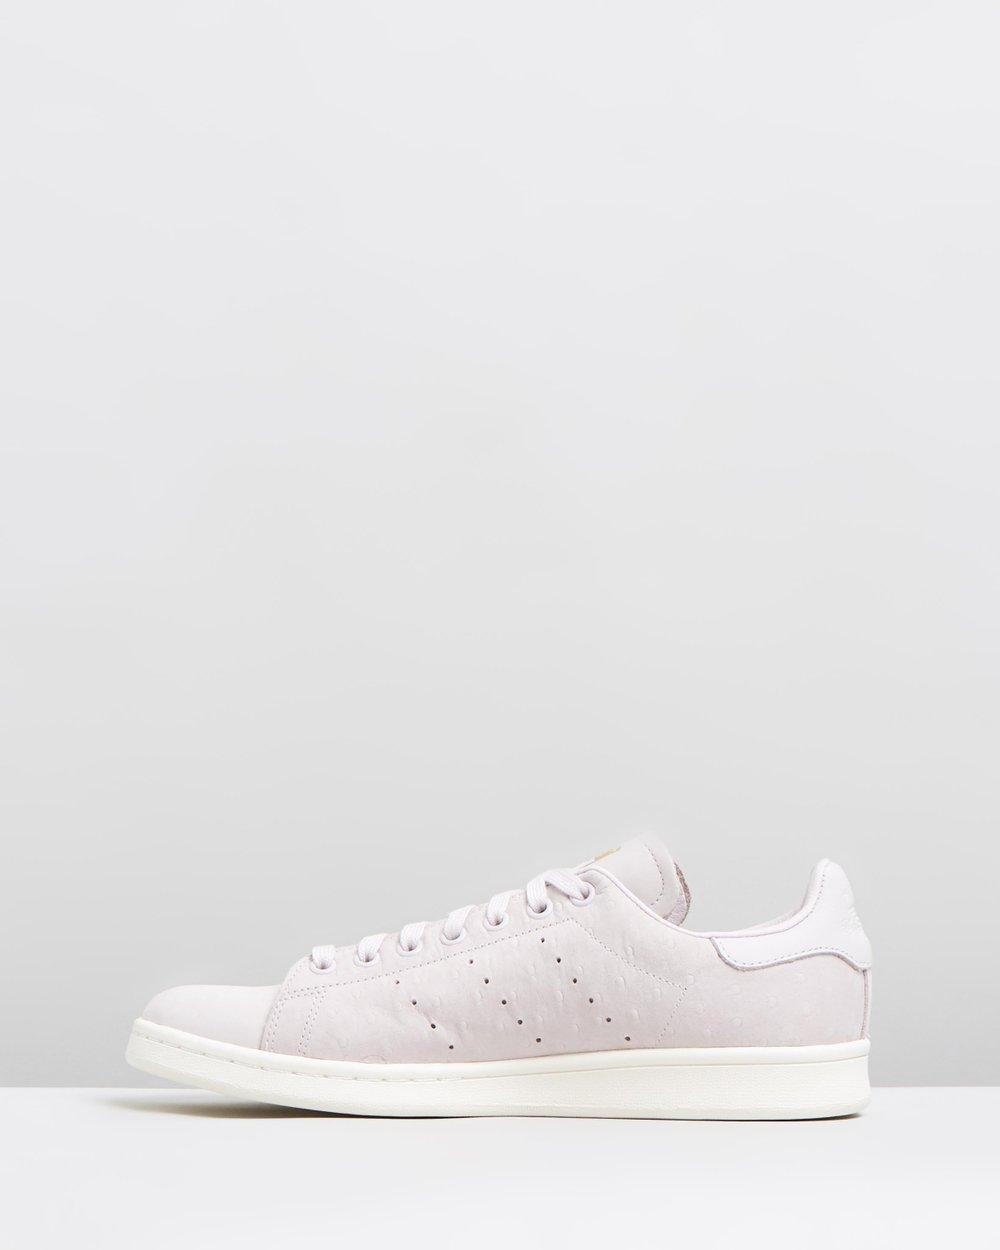 13e93d8b46c4fd Stan Smith - Women s by adidas Originals Online